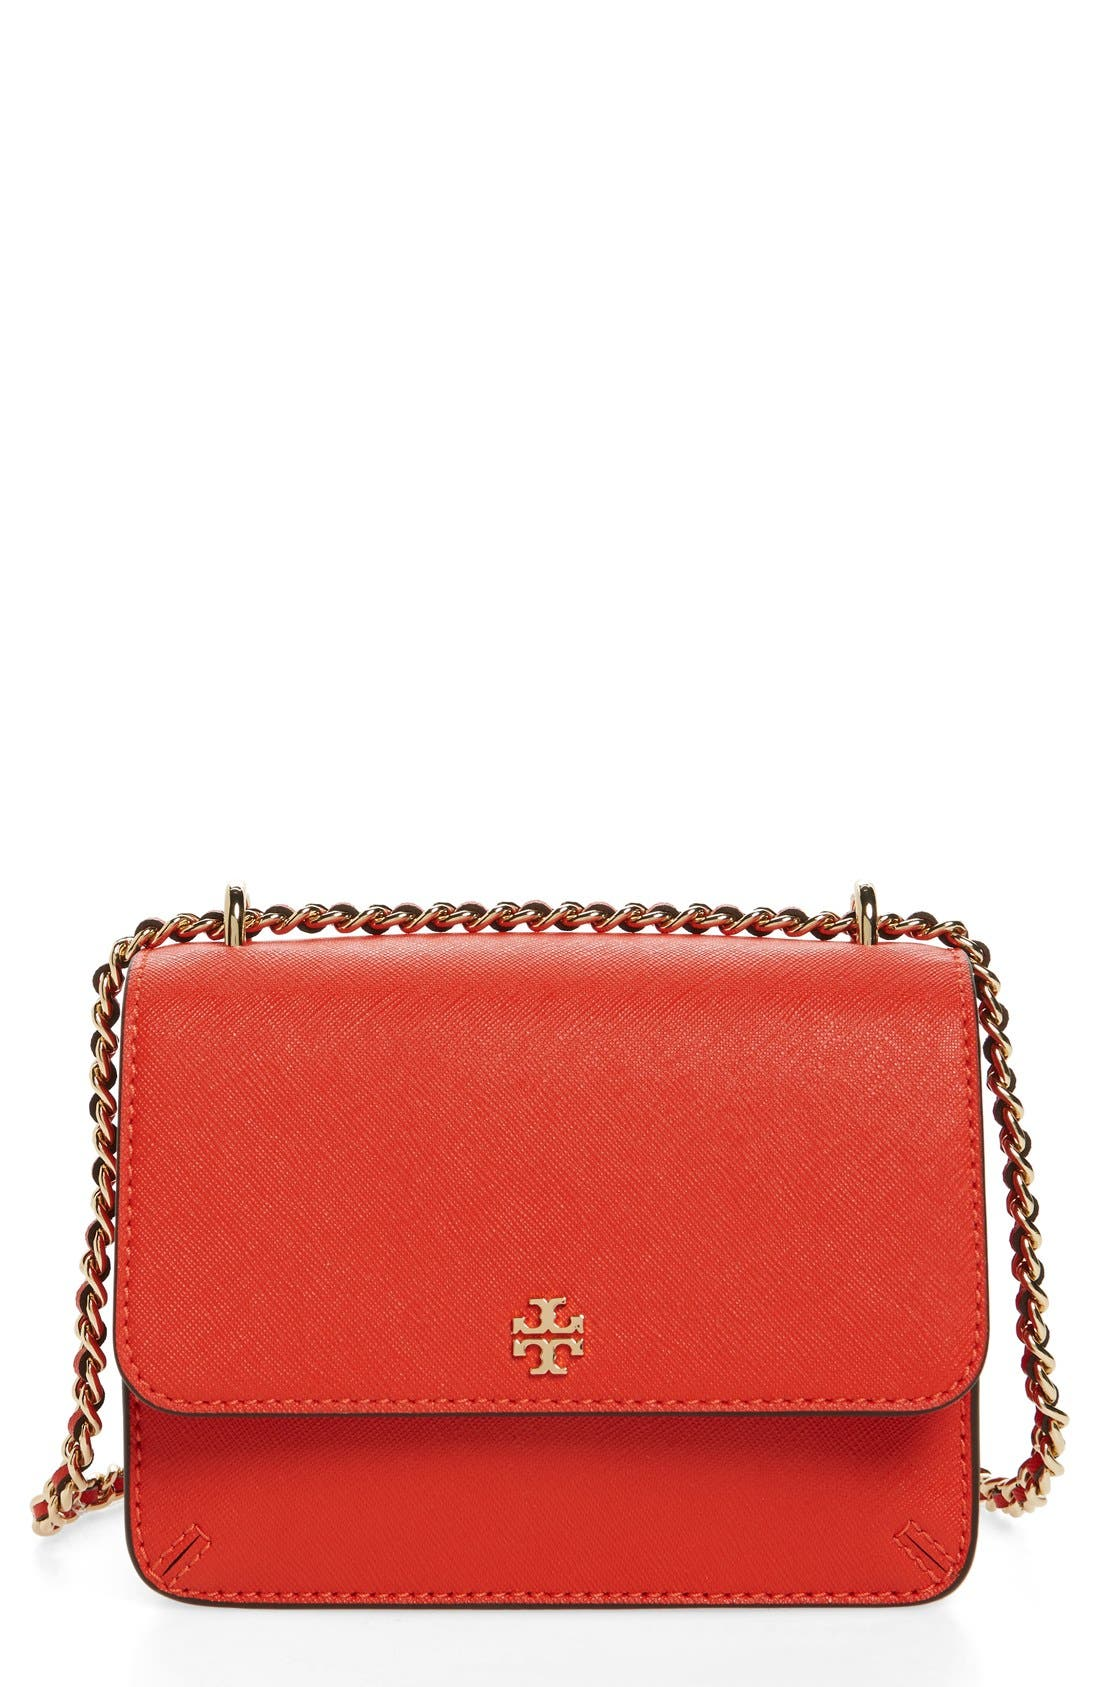 Main Image - Tory Burch Mini Robinson Convertible Leather Shoulder Bag